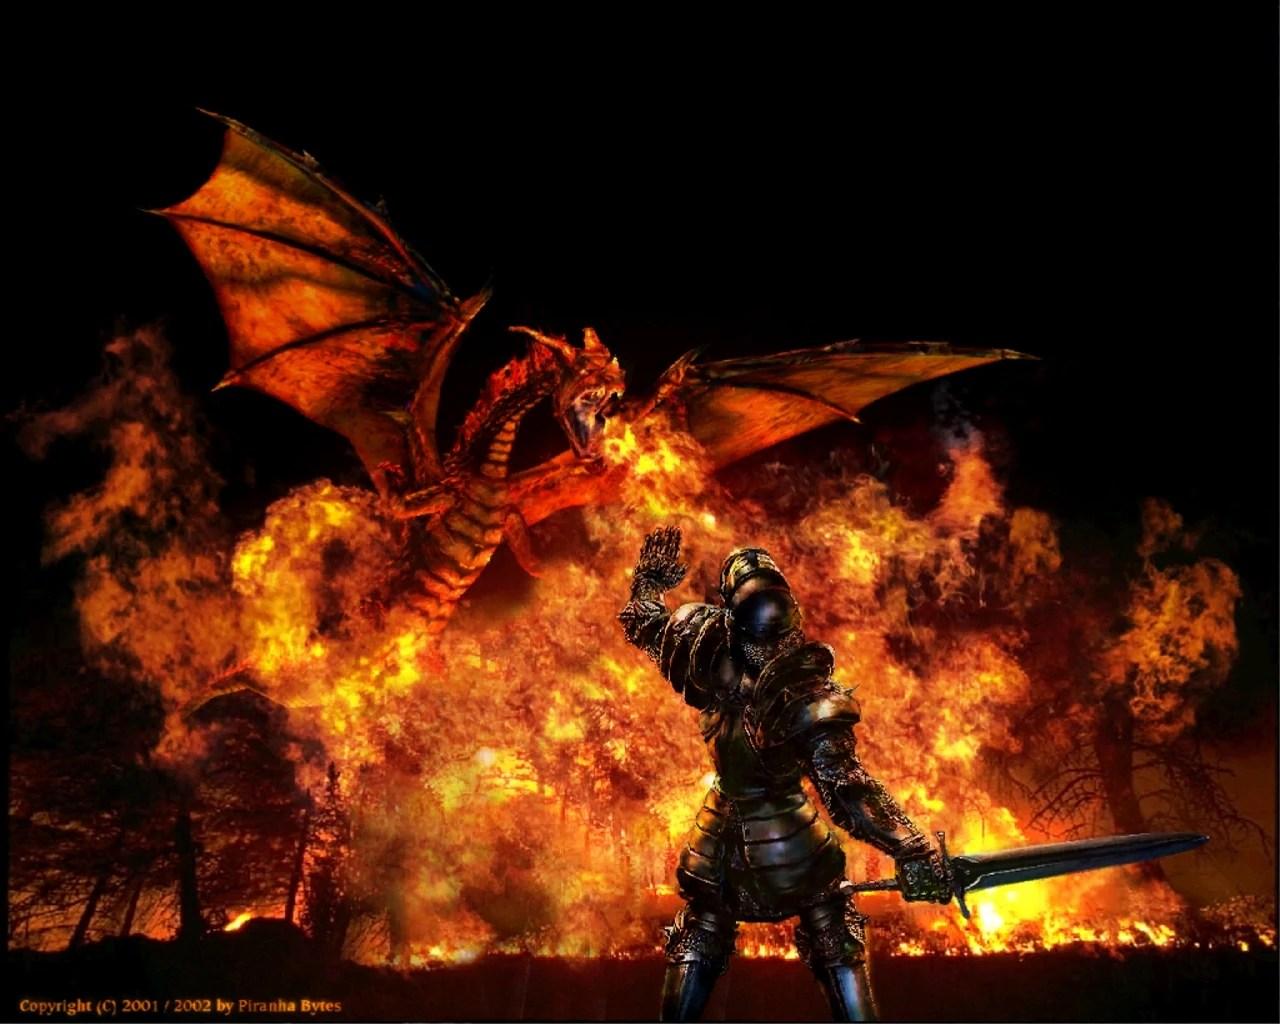 Bleach Wallpapers Hd 1080p Smoki Z Khorinis Gothicpedia Kompletna Encyklopedia O